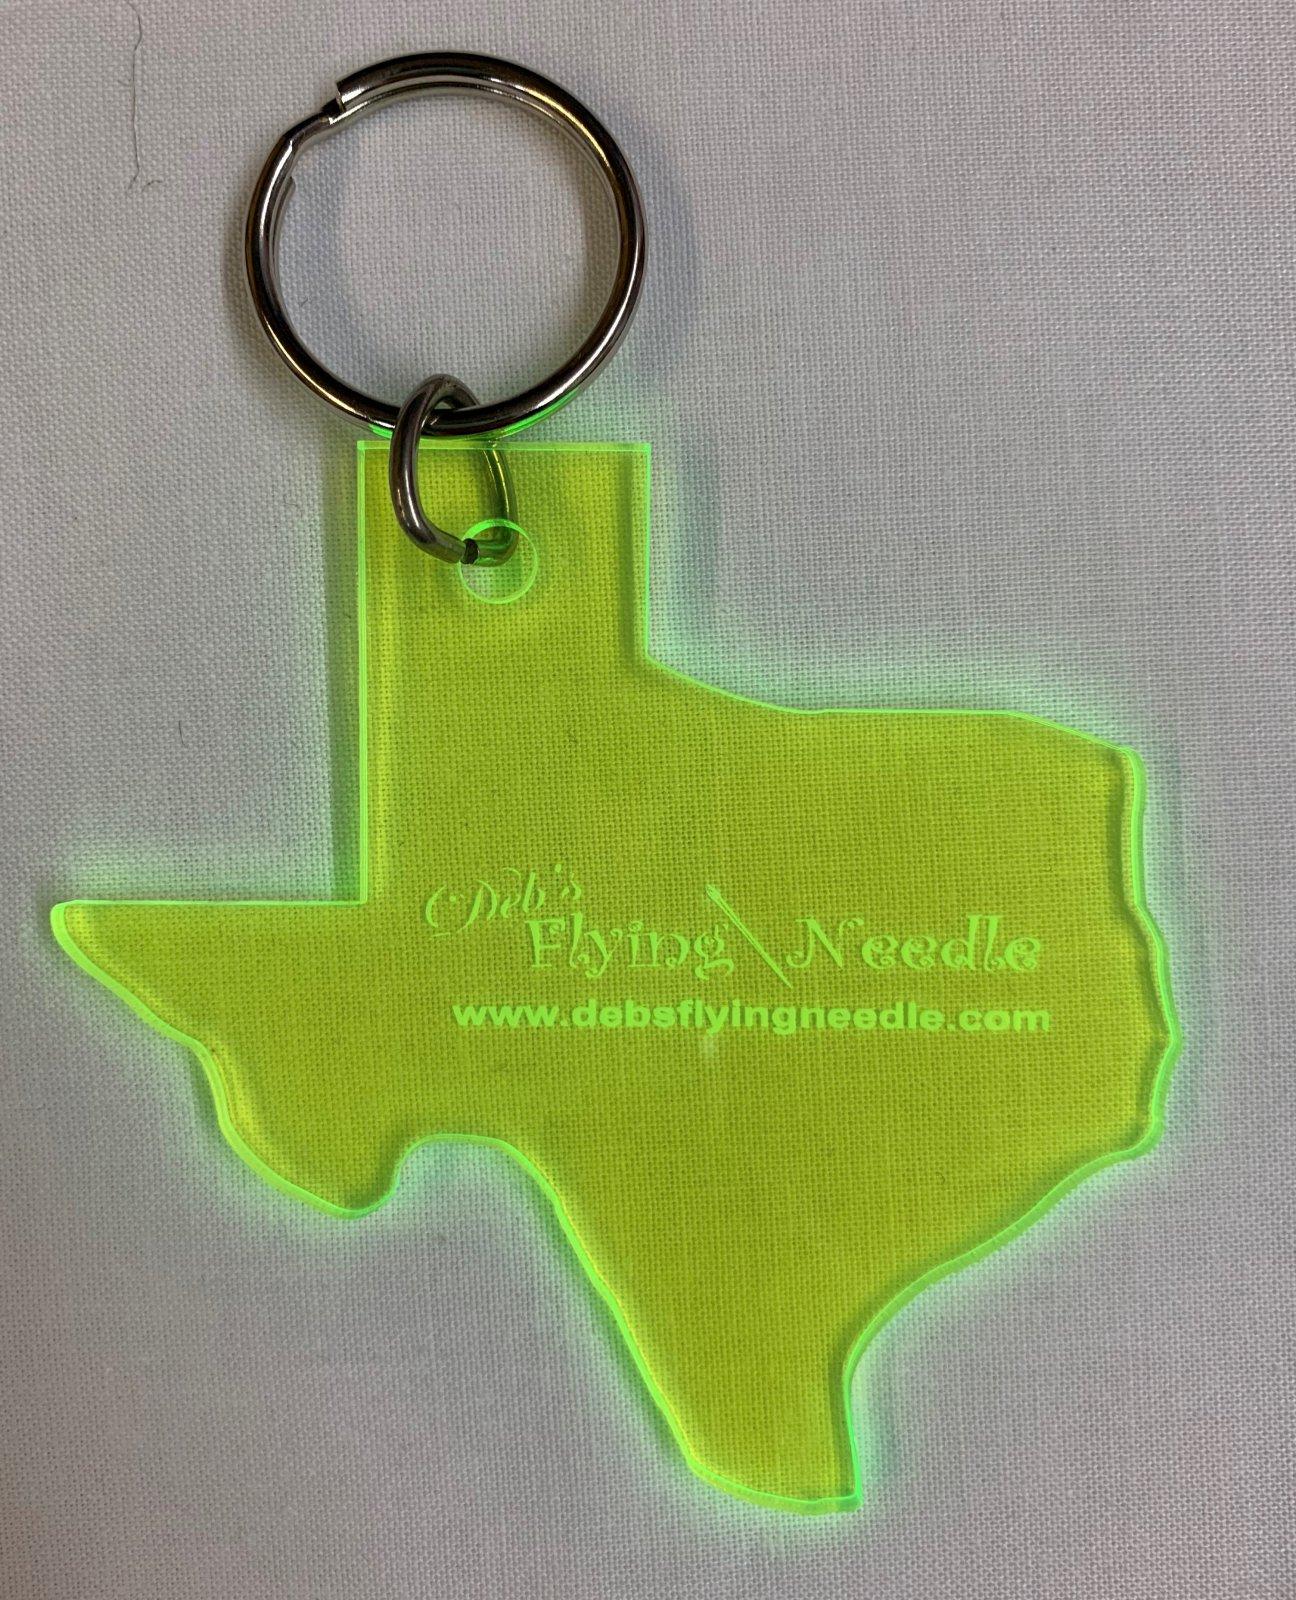 Keychain - Texas Acrylic